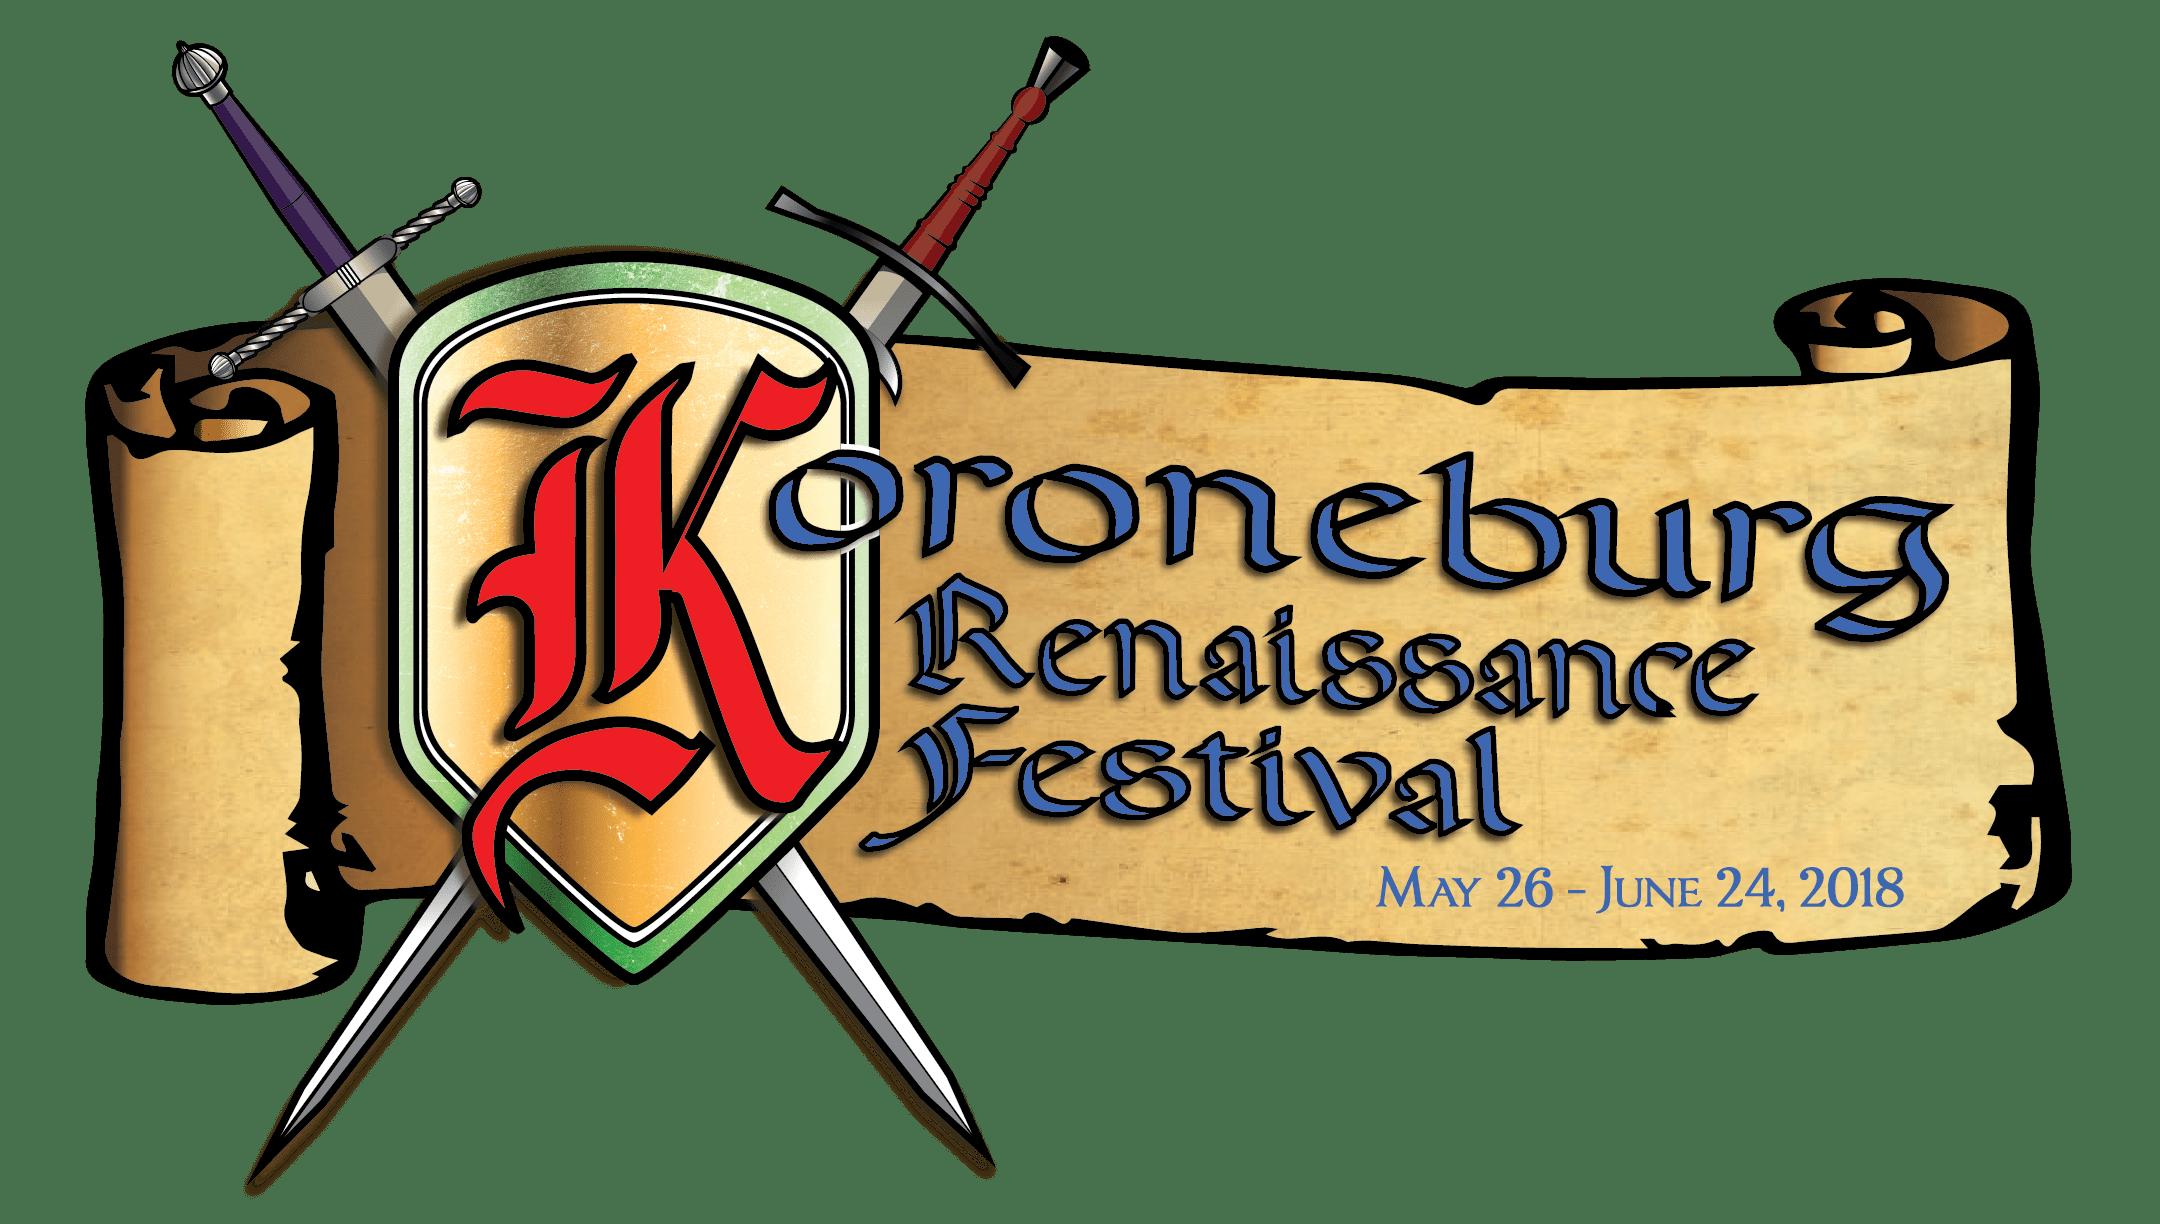 Knight clipart horse line drawing. Koroneburg renaissance festival